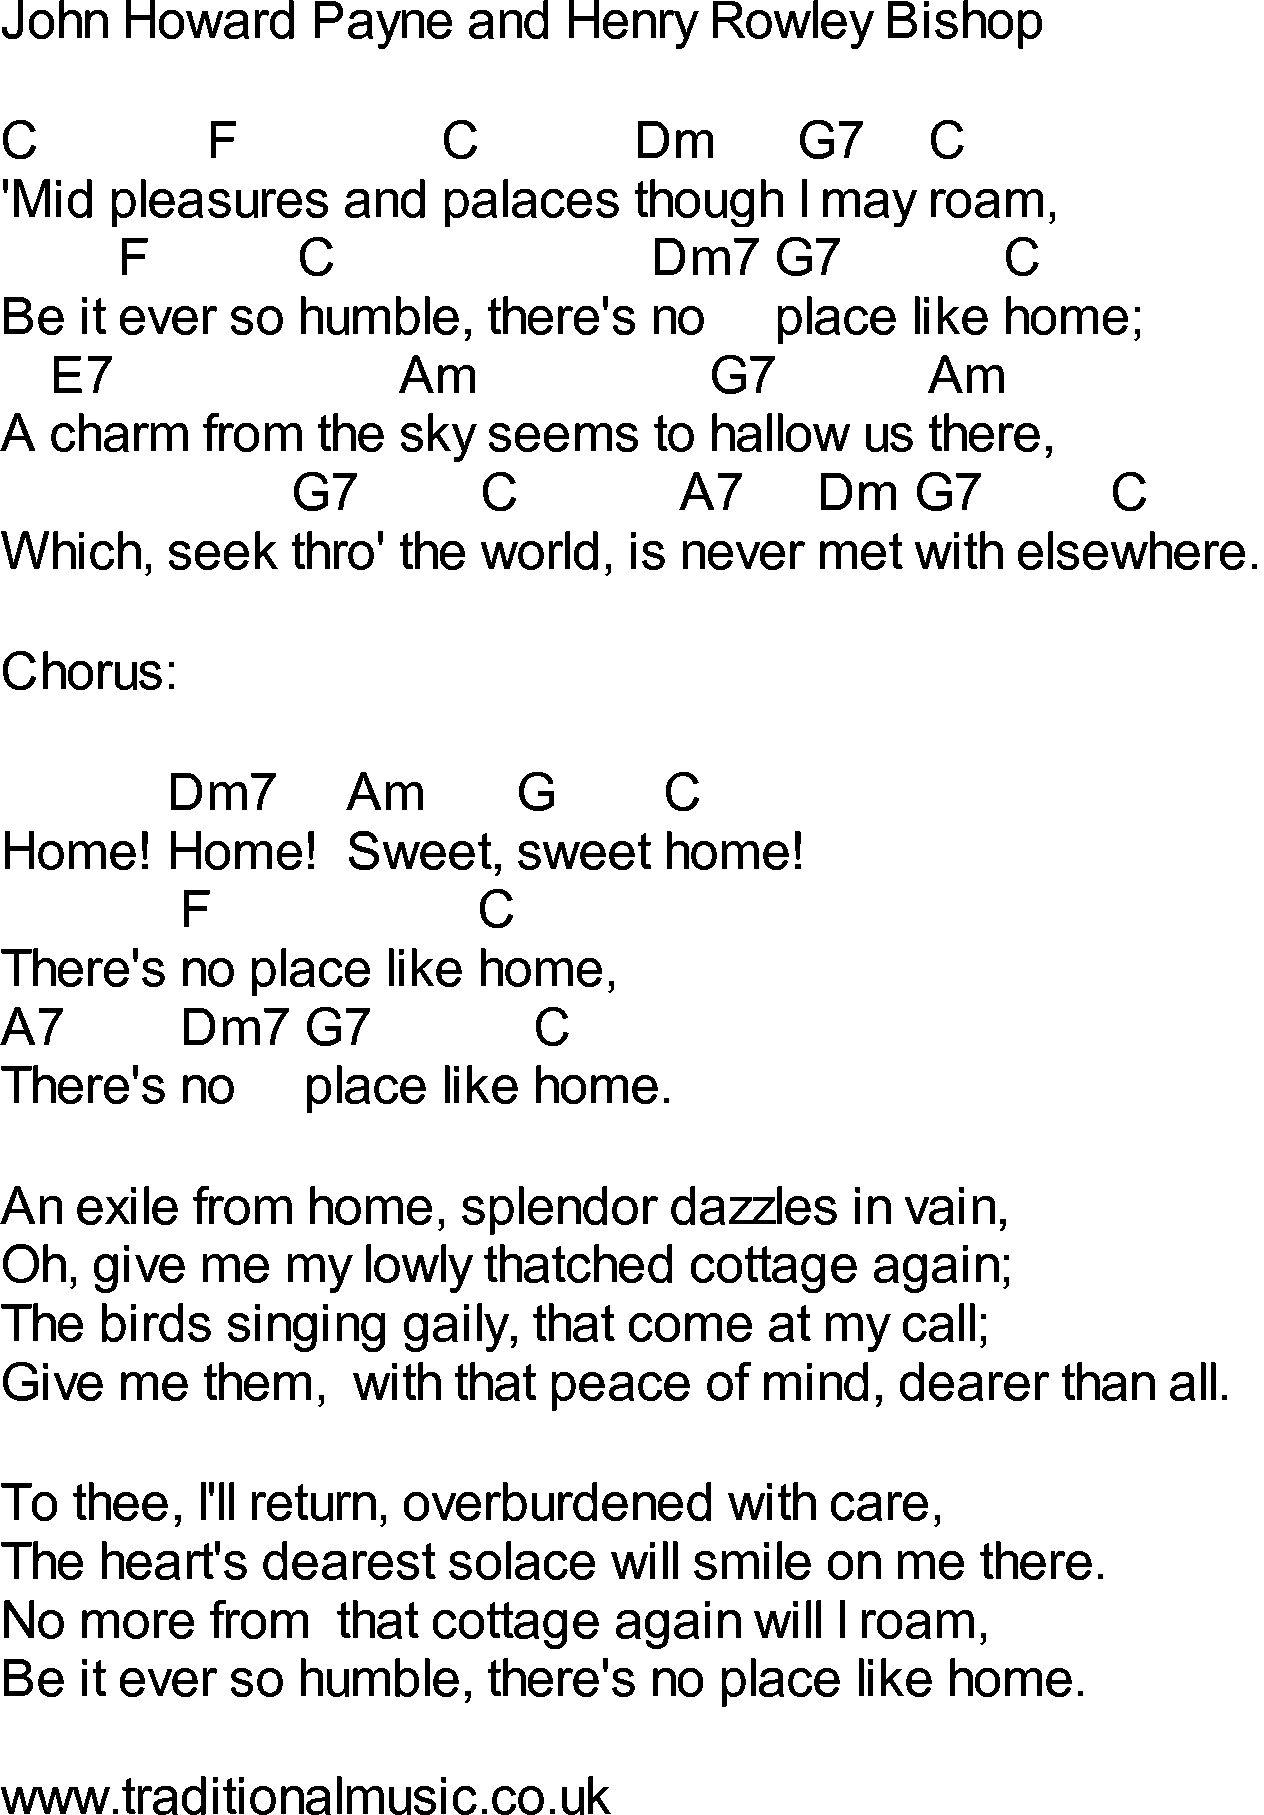 Lynyrd skynyrd sweet home alabama: Sweet Home Alabama Chords Sweet Home Alabama Chords Sweet Home Alabama Guitar Lyrics And Chords